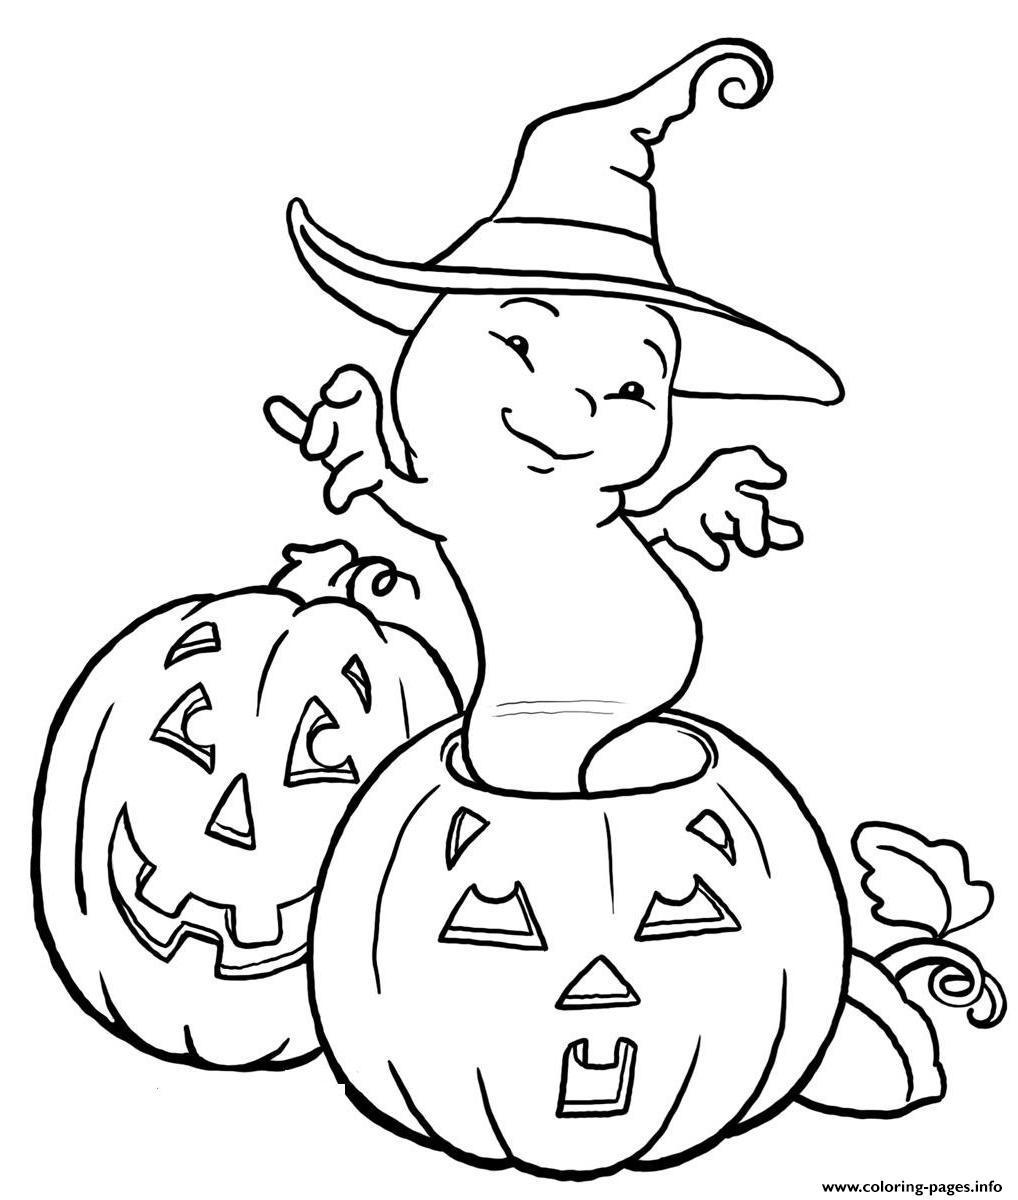 Halloween Ghost And Pumpkin S Kidseade Coloring Pages Printable